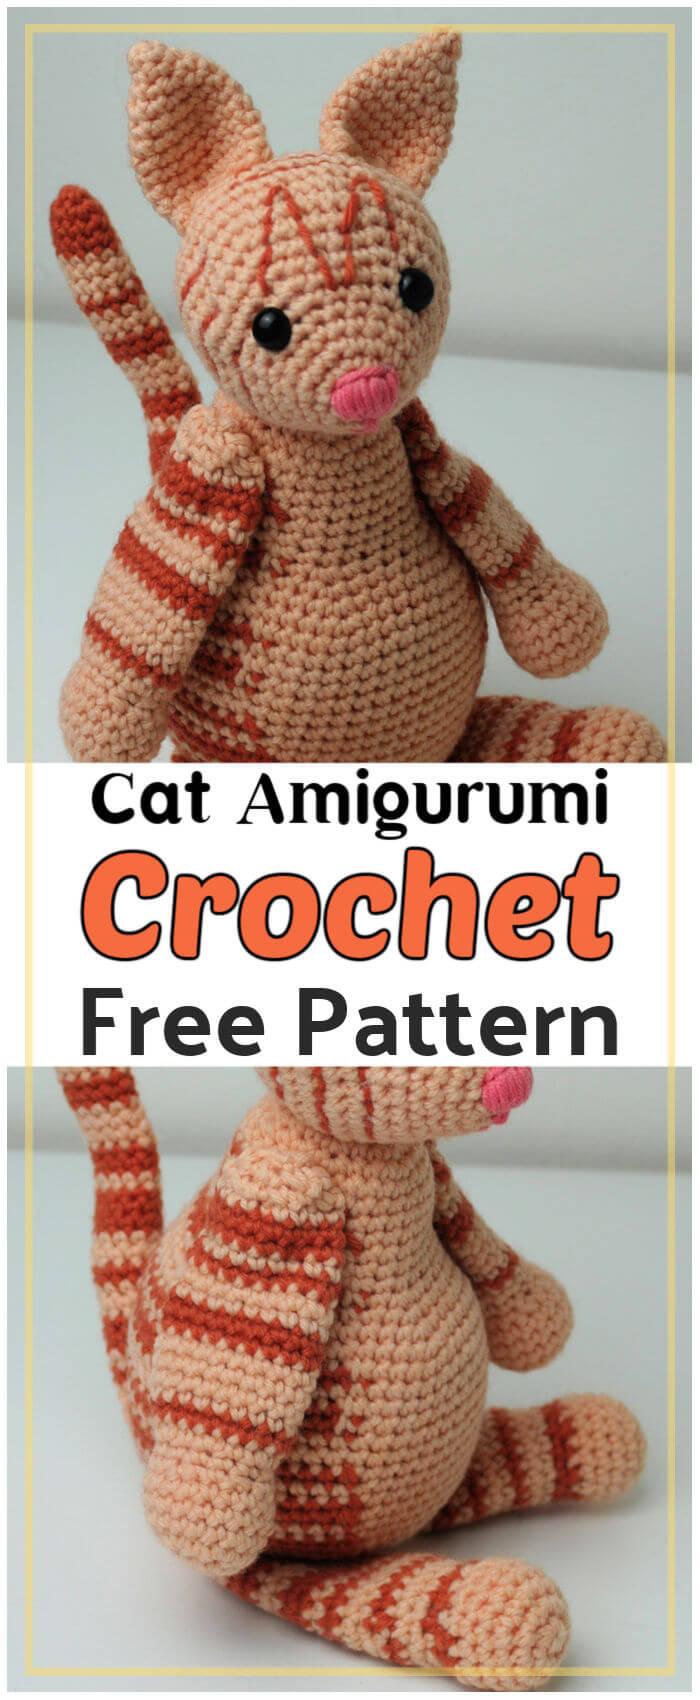 Cat Amigurumi Free Crochet Pattern